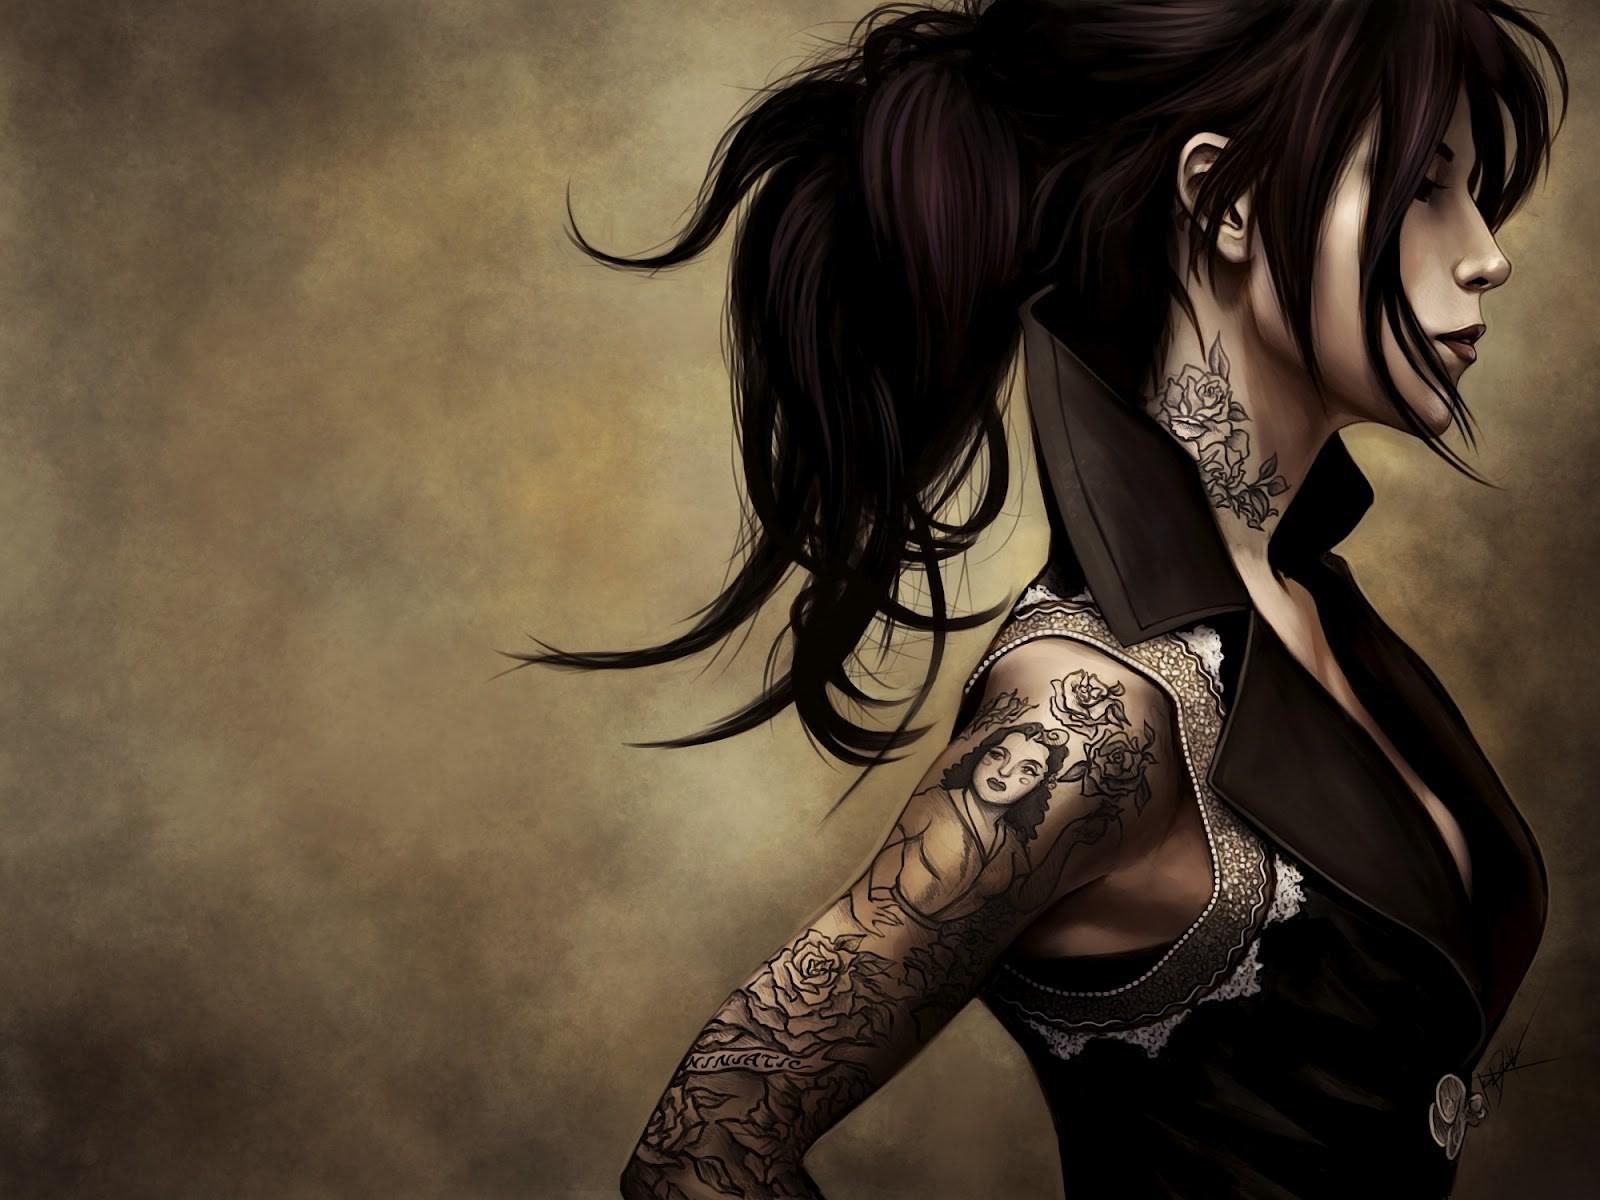 Drawing Women Model Anime Black Hair Kat Von D Darkness Hairstyle Art Woman Warrior